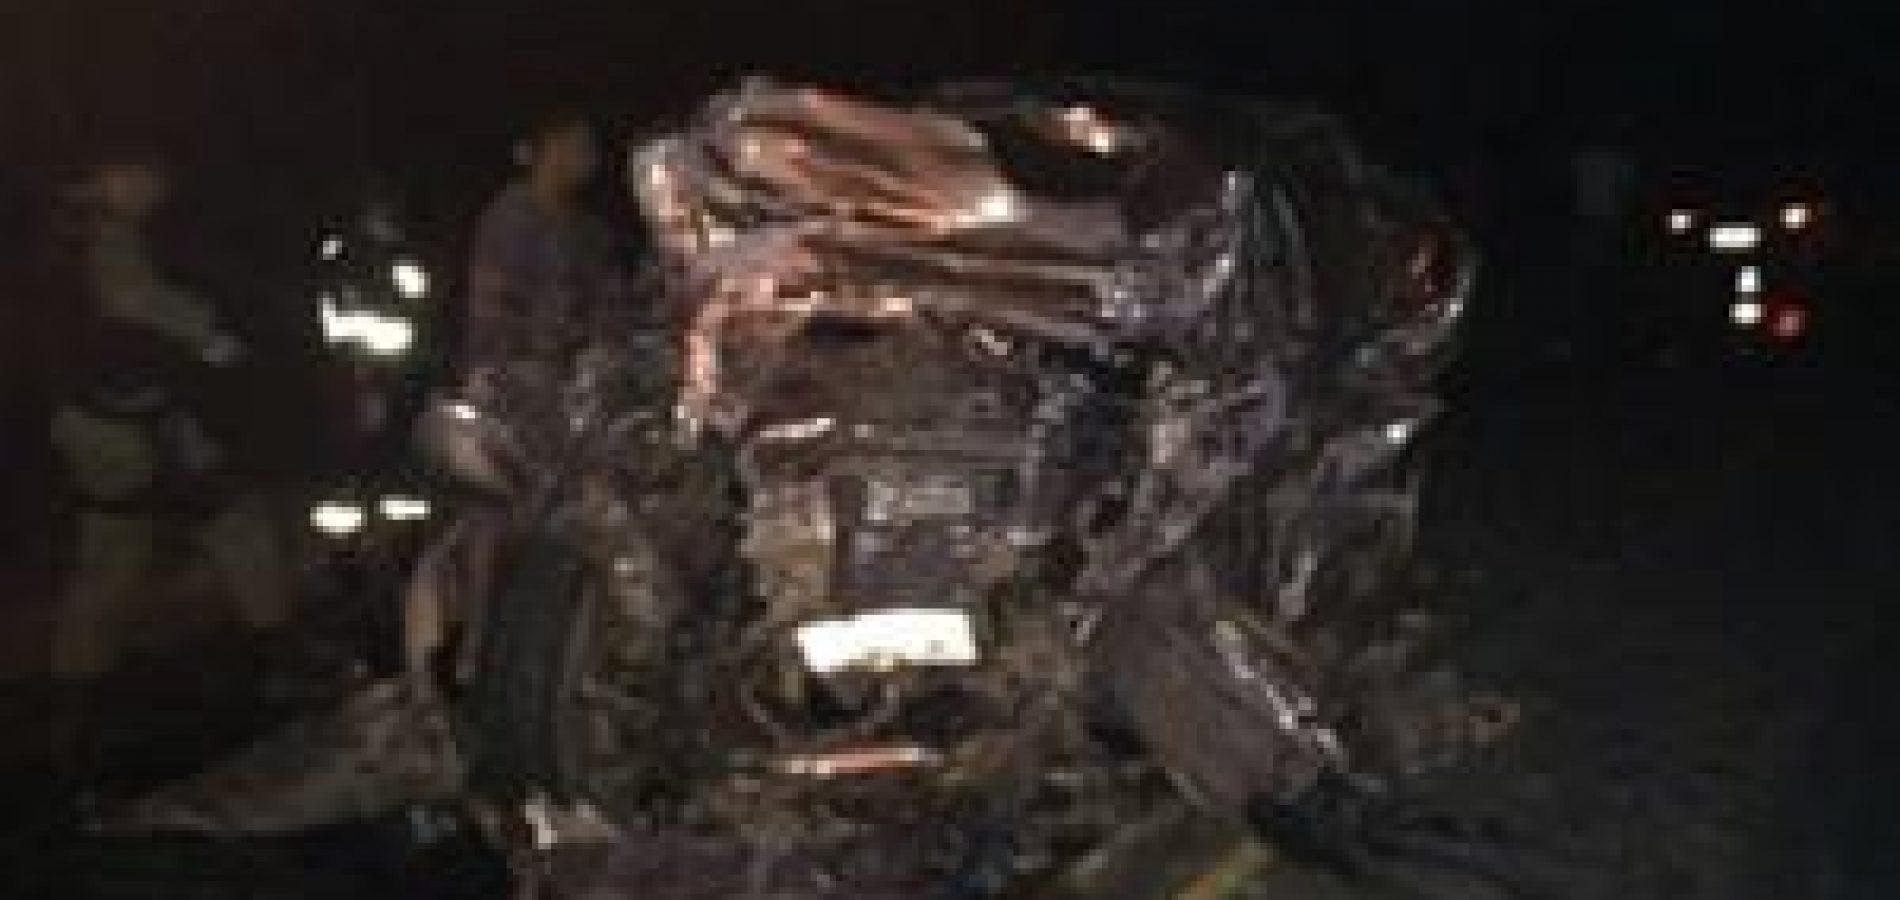 Veículo envolvido no acidente que matou o prefeito seria roubado